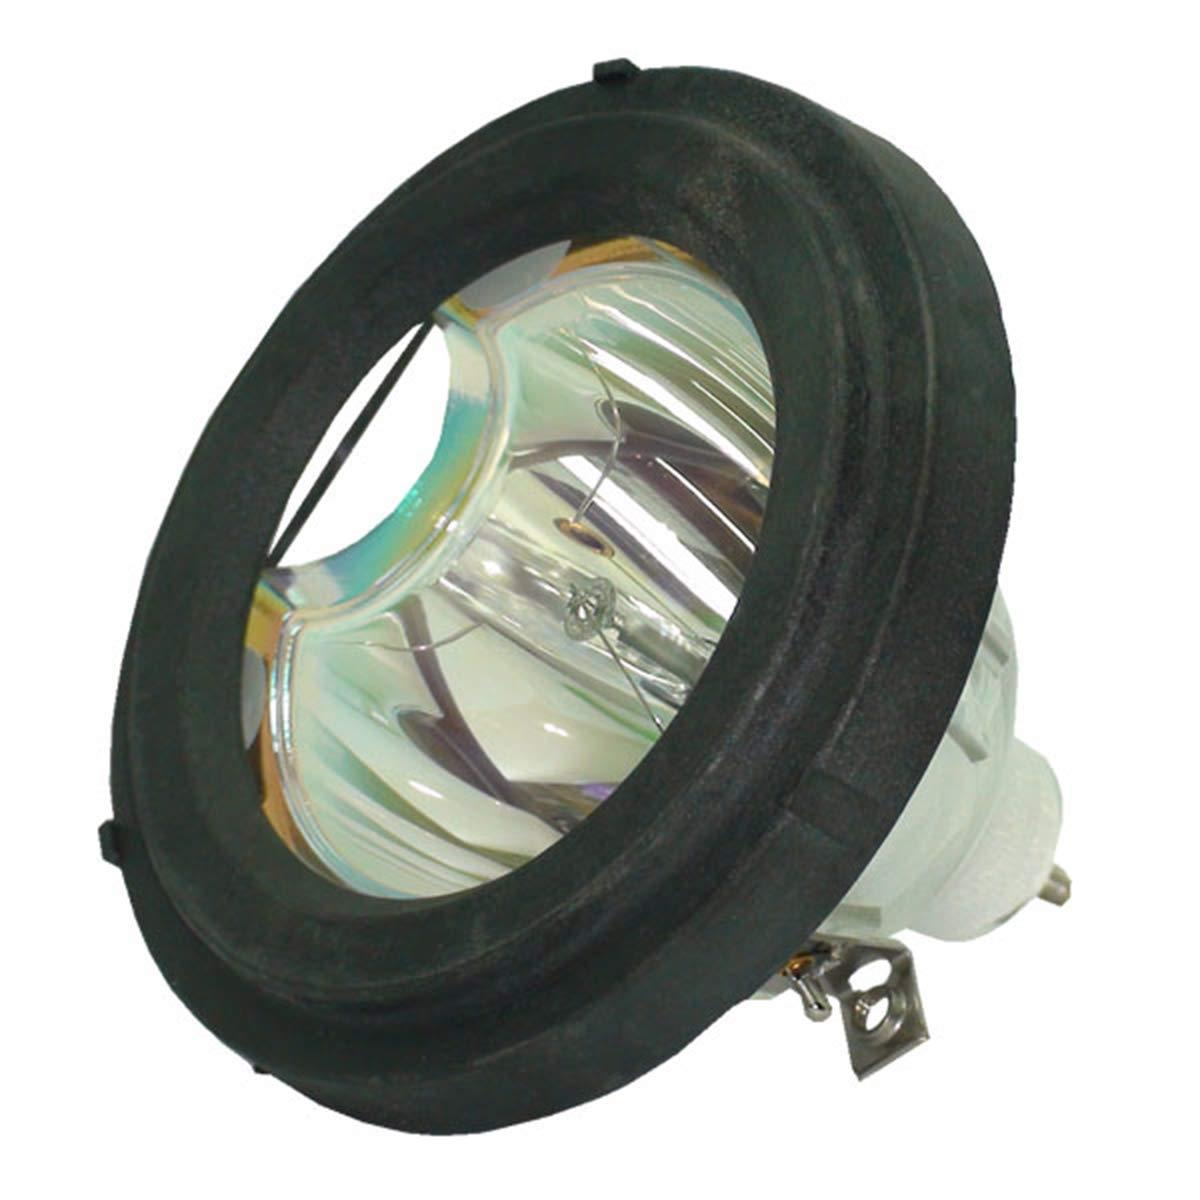 SpArc OEM テレビ交換用ランプ 囲い/電球付き Zenith 62SX4R用 Platinum (Brighter/Durable) B07MPSNXLG Lamp Only Platinum (Brighter/Durable)